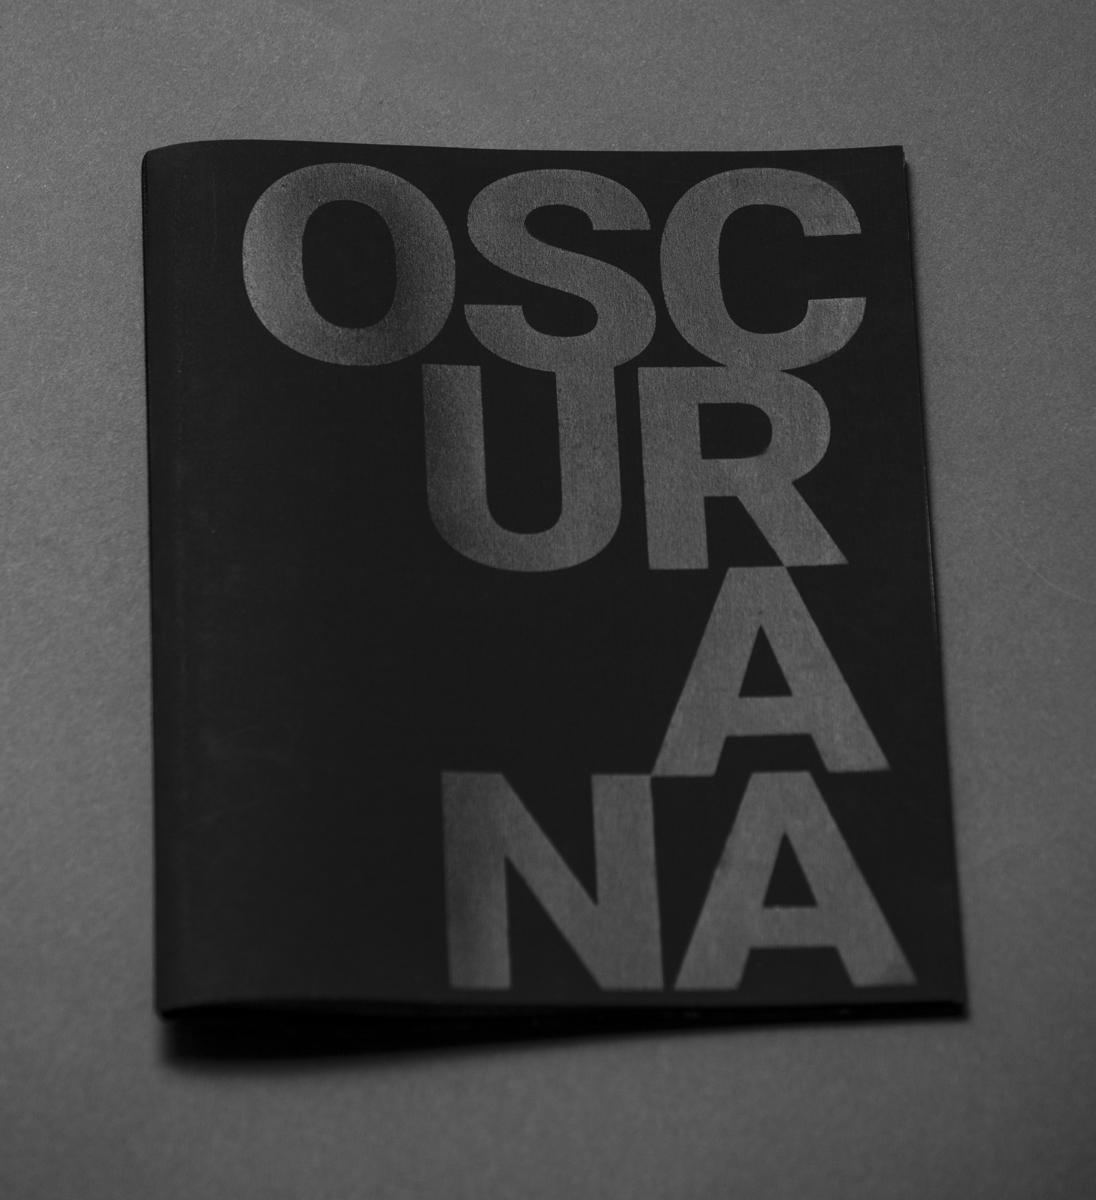 Oscurana - Sub, Editora